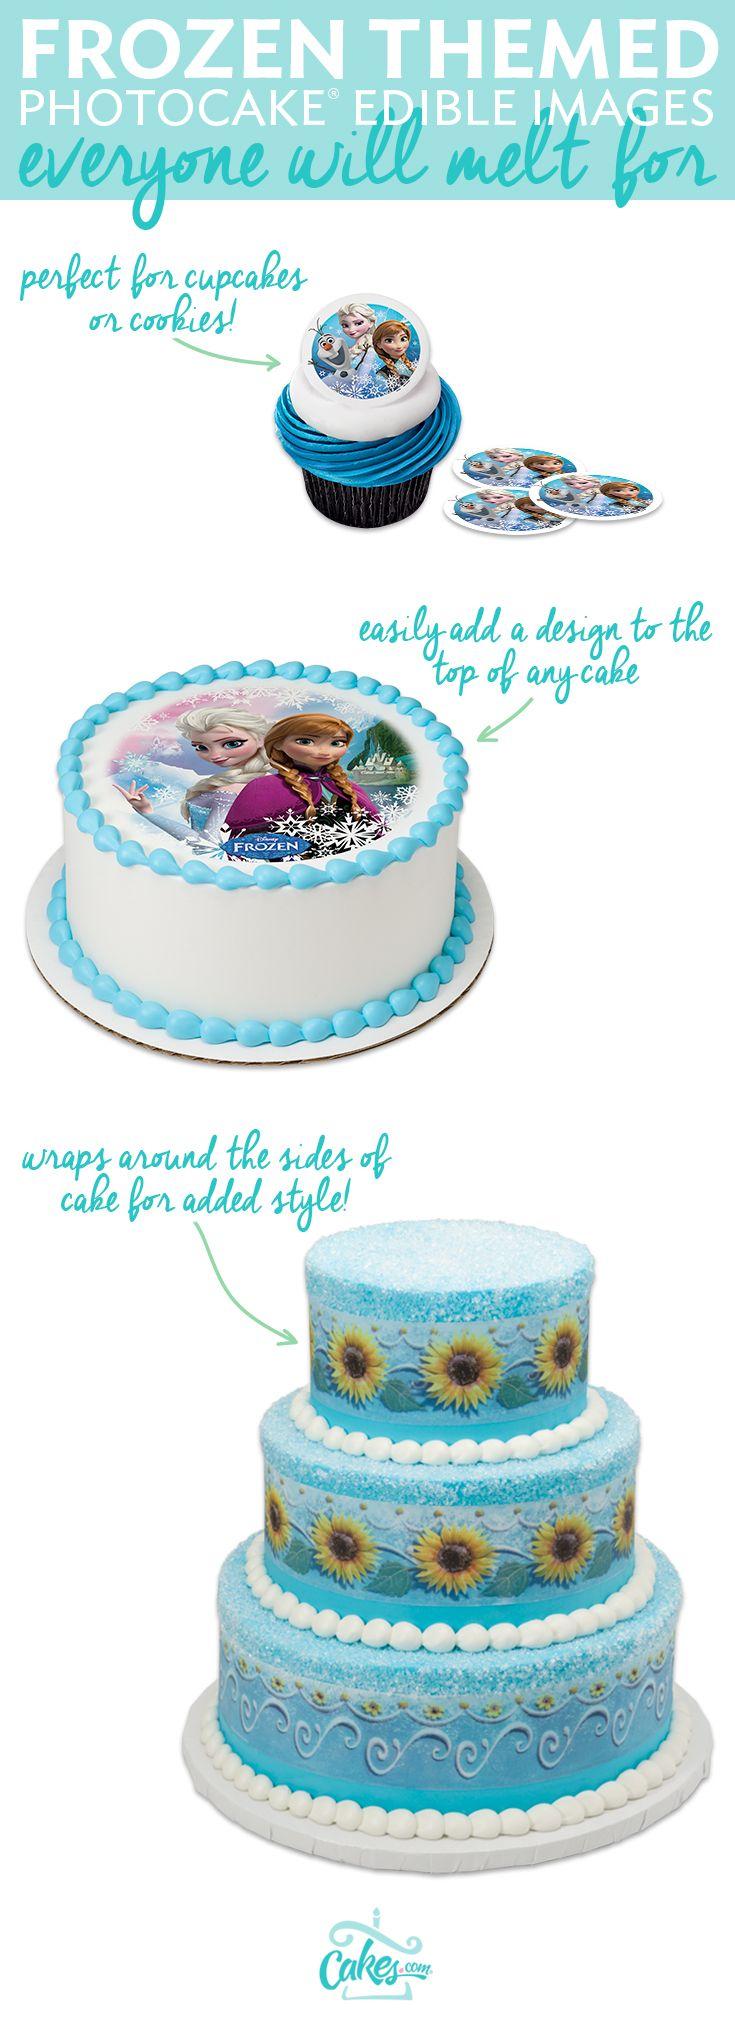 Creating a fun Frozen cake for your little princess has never been easier than when using a PhotoCake® Edible Cake Image.